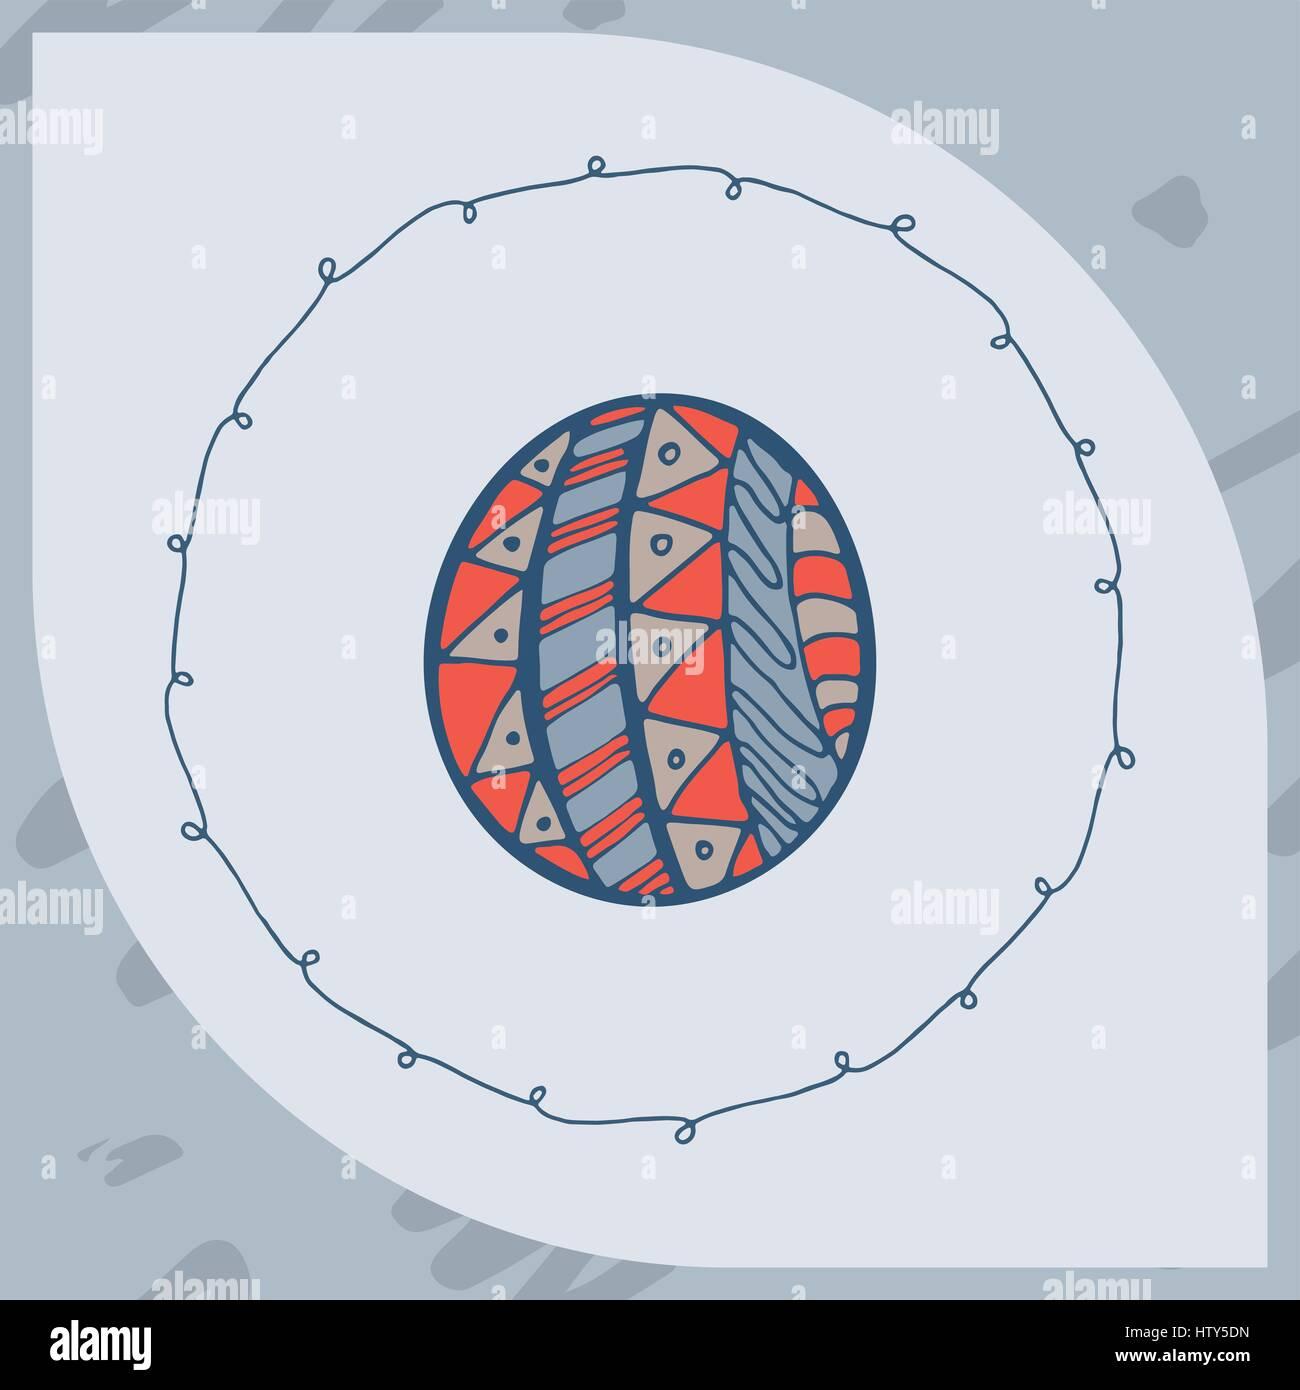 Vector of greeting card with easter egg symbol stock vector art vector of greeting card with easter egg symbol buycottarizona